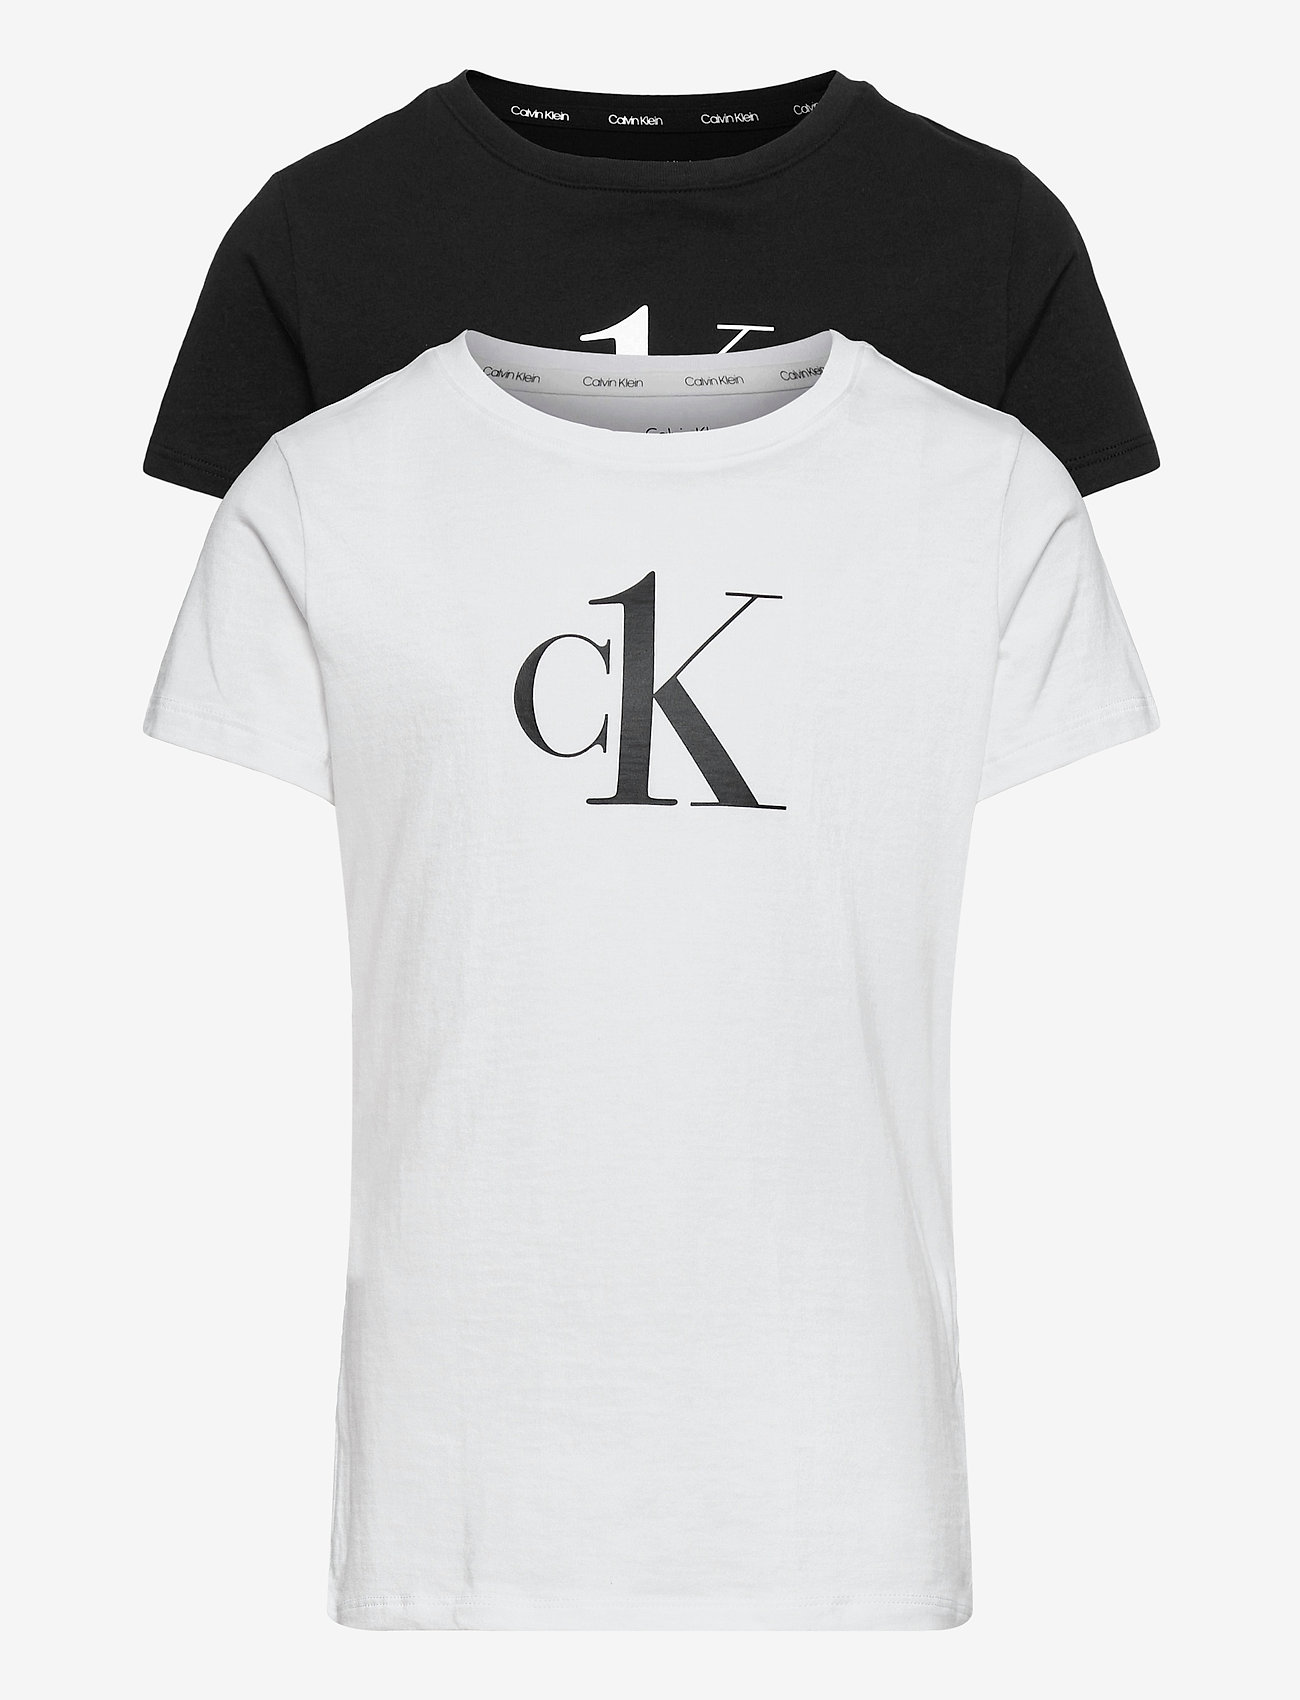 Calvin Klein - 2PK TEES - t-shirts - pvhwhite/pvhblack - 0